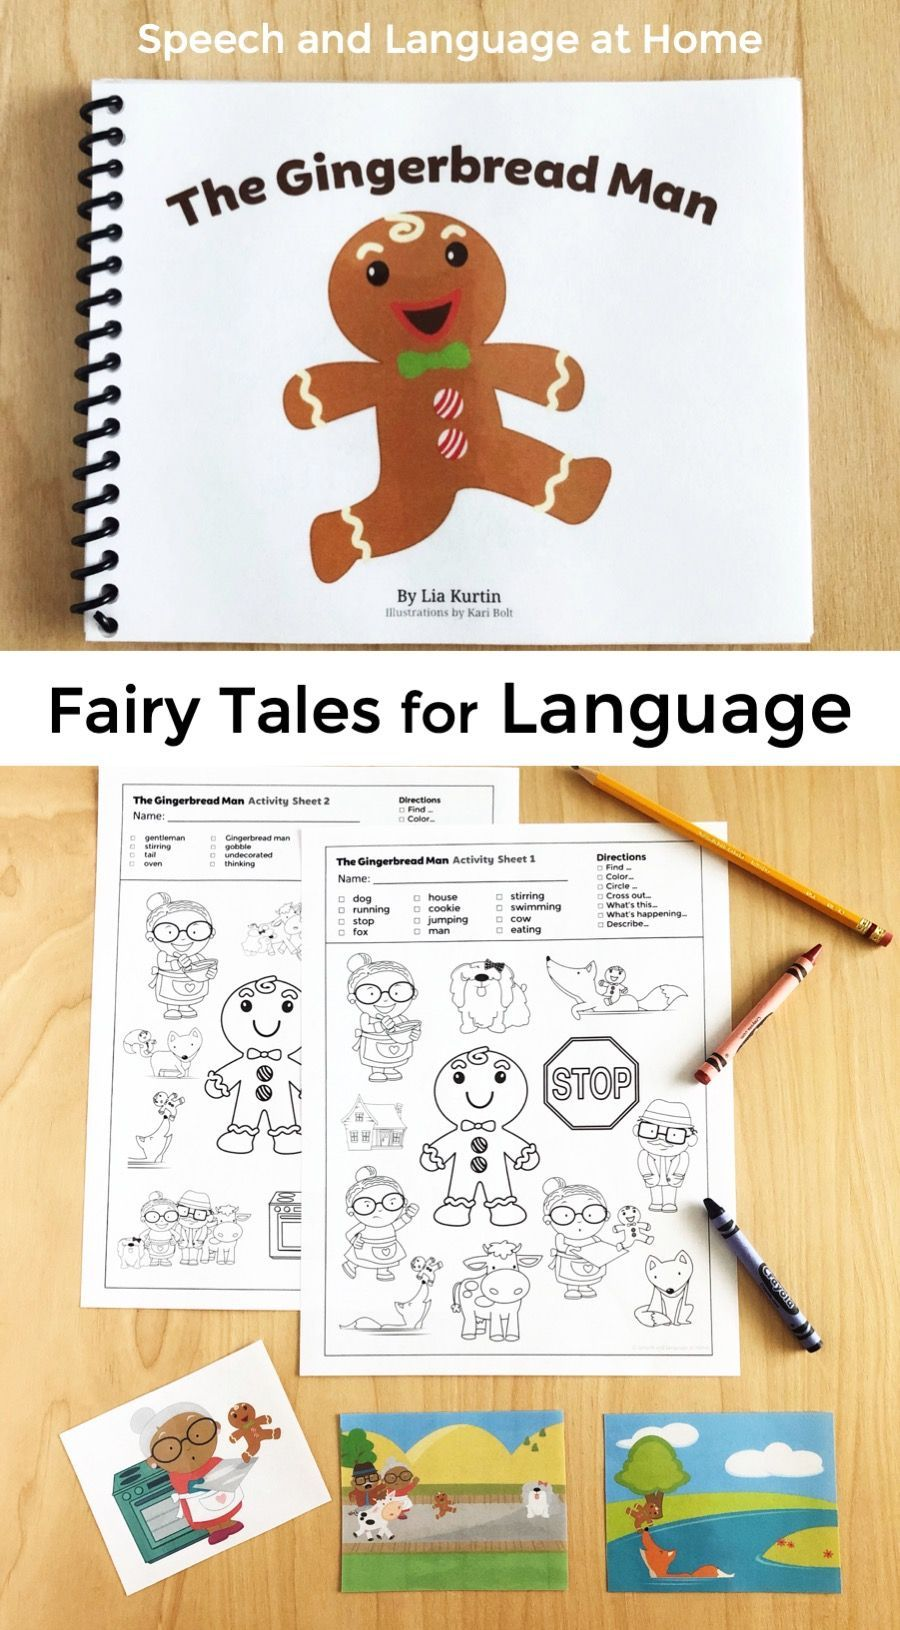 The Gingerbread Man Is A Classic Fairy Tale Toddlers Preschool And Kindergarten Stude Speech Therapy Toddler Gingerbread Man Kindergarten Preschool Activities [ 1630 x 900 Pixel ]